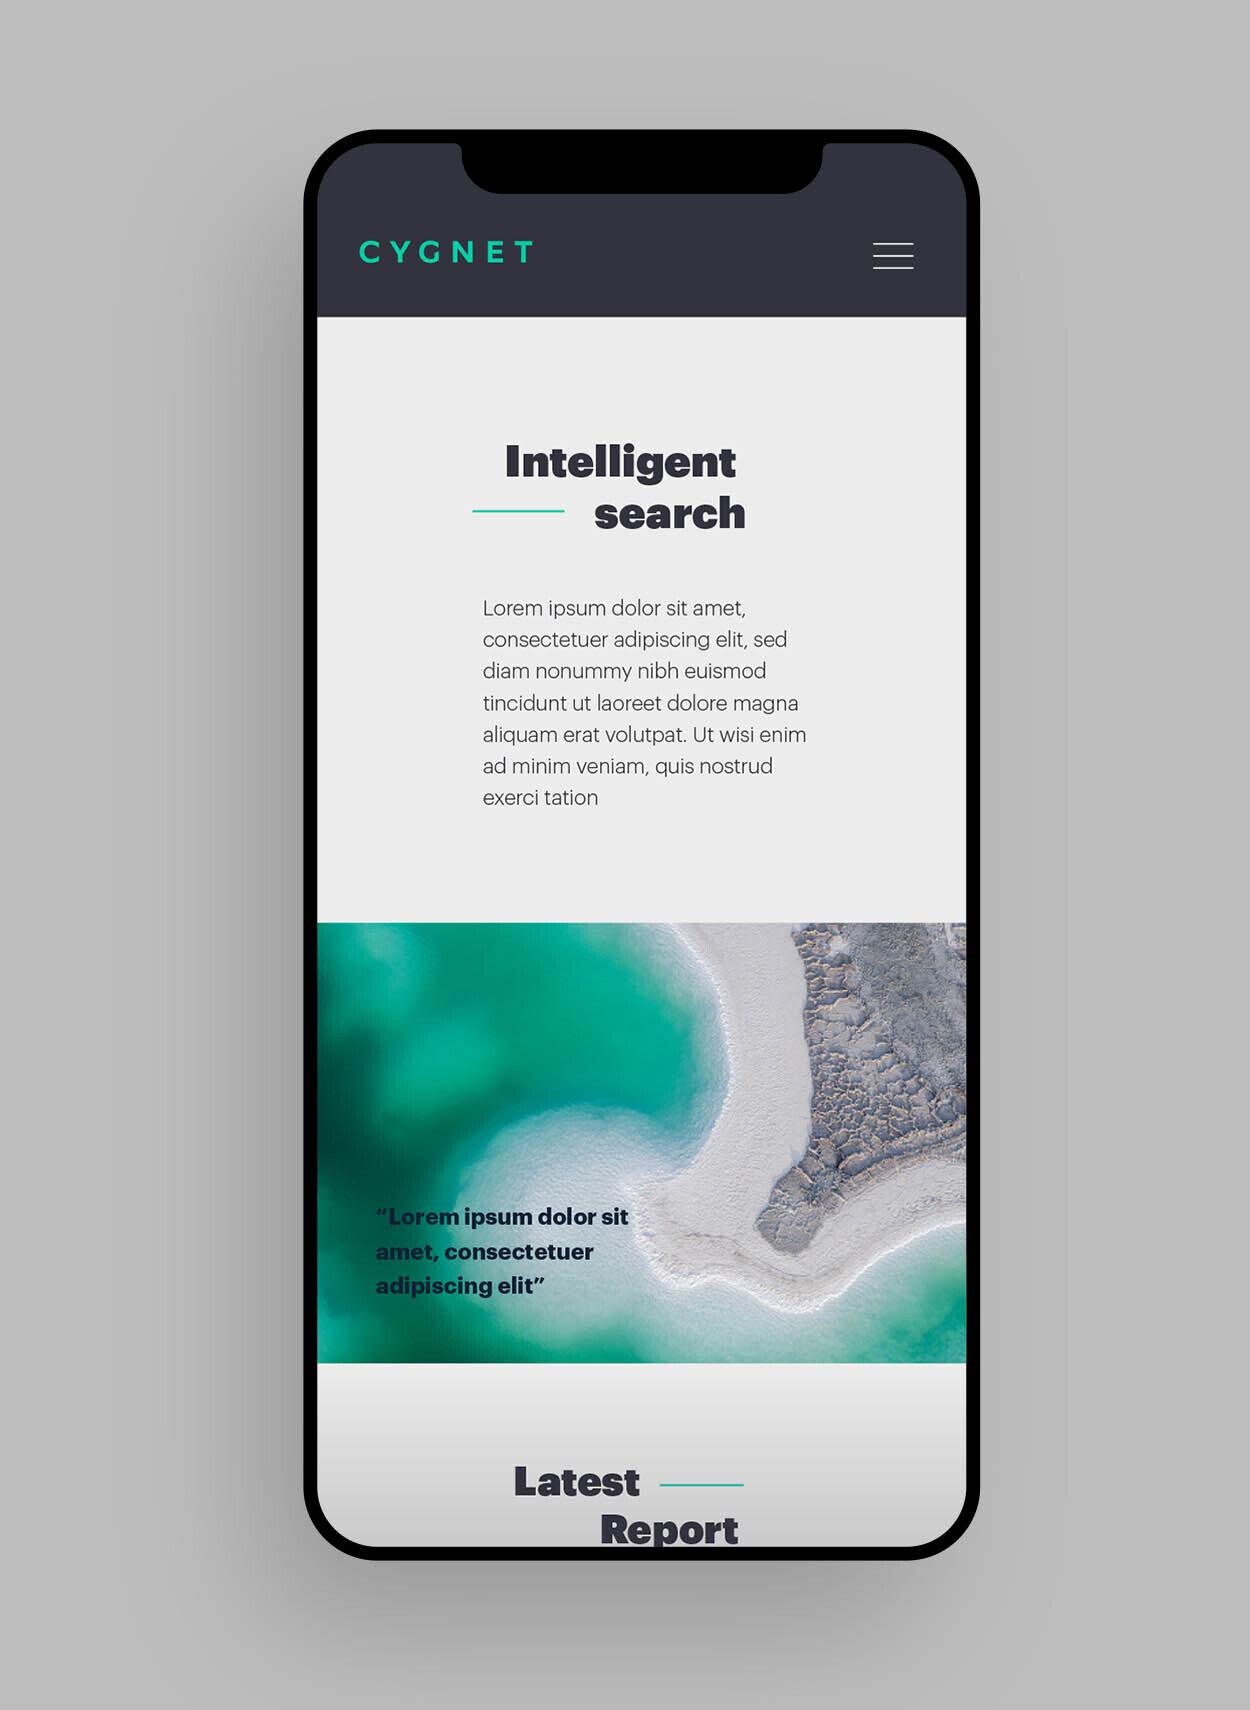 12 Cygnet 1250x1710